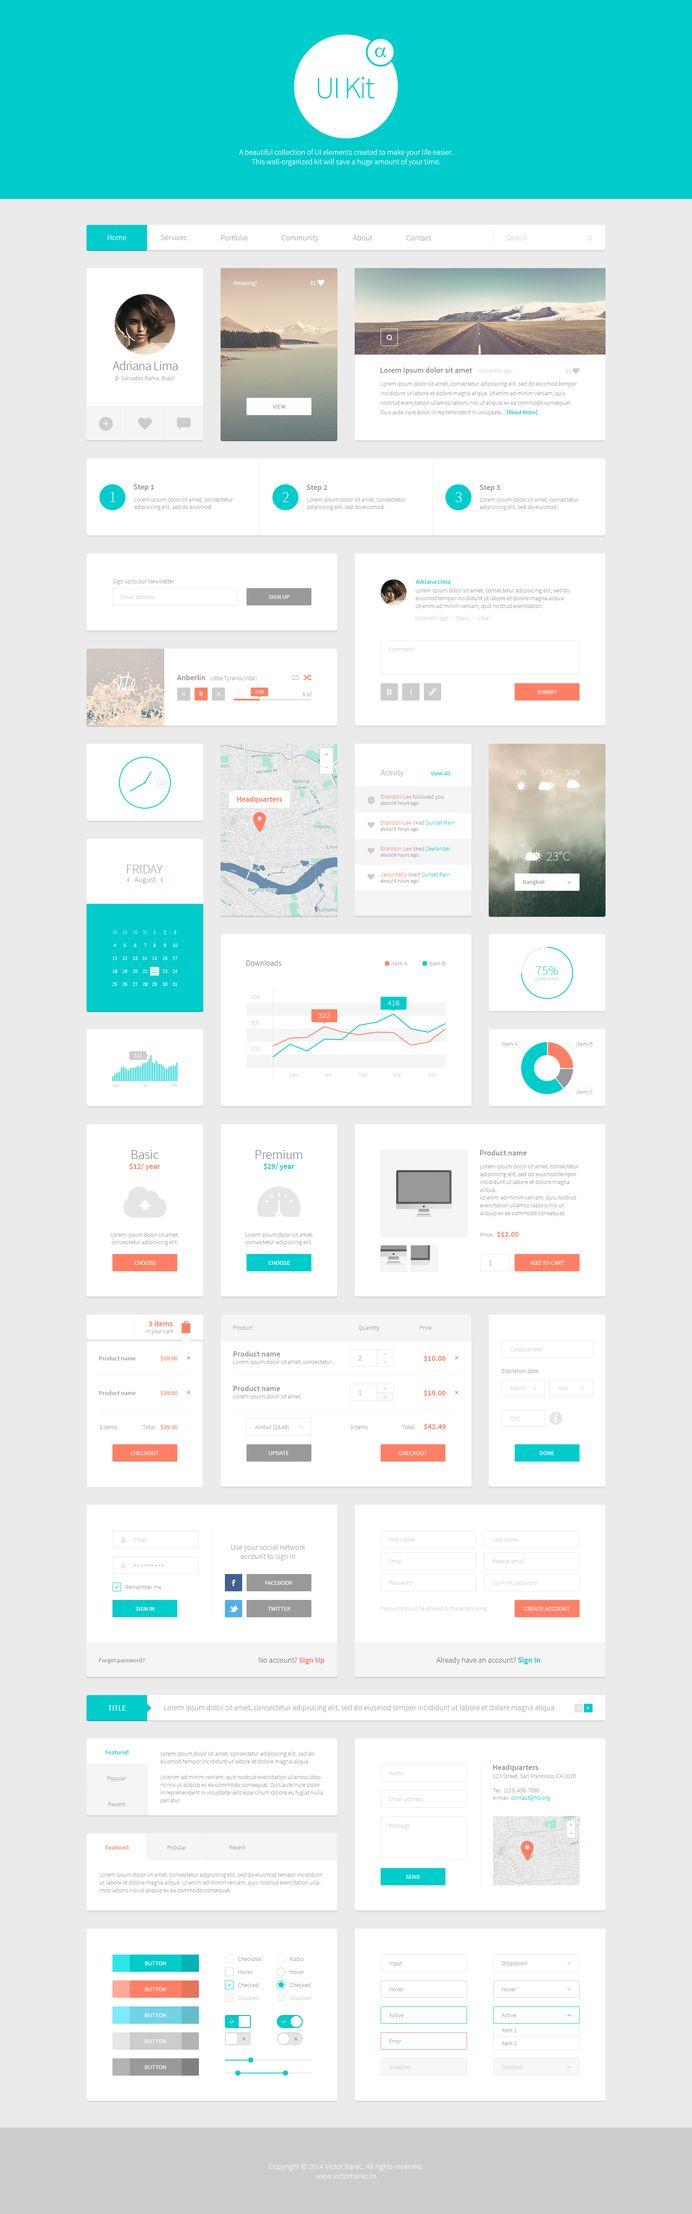 Designspiration — Design Inspiration